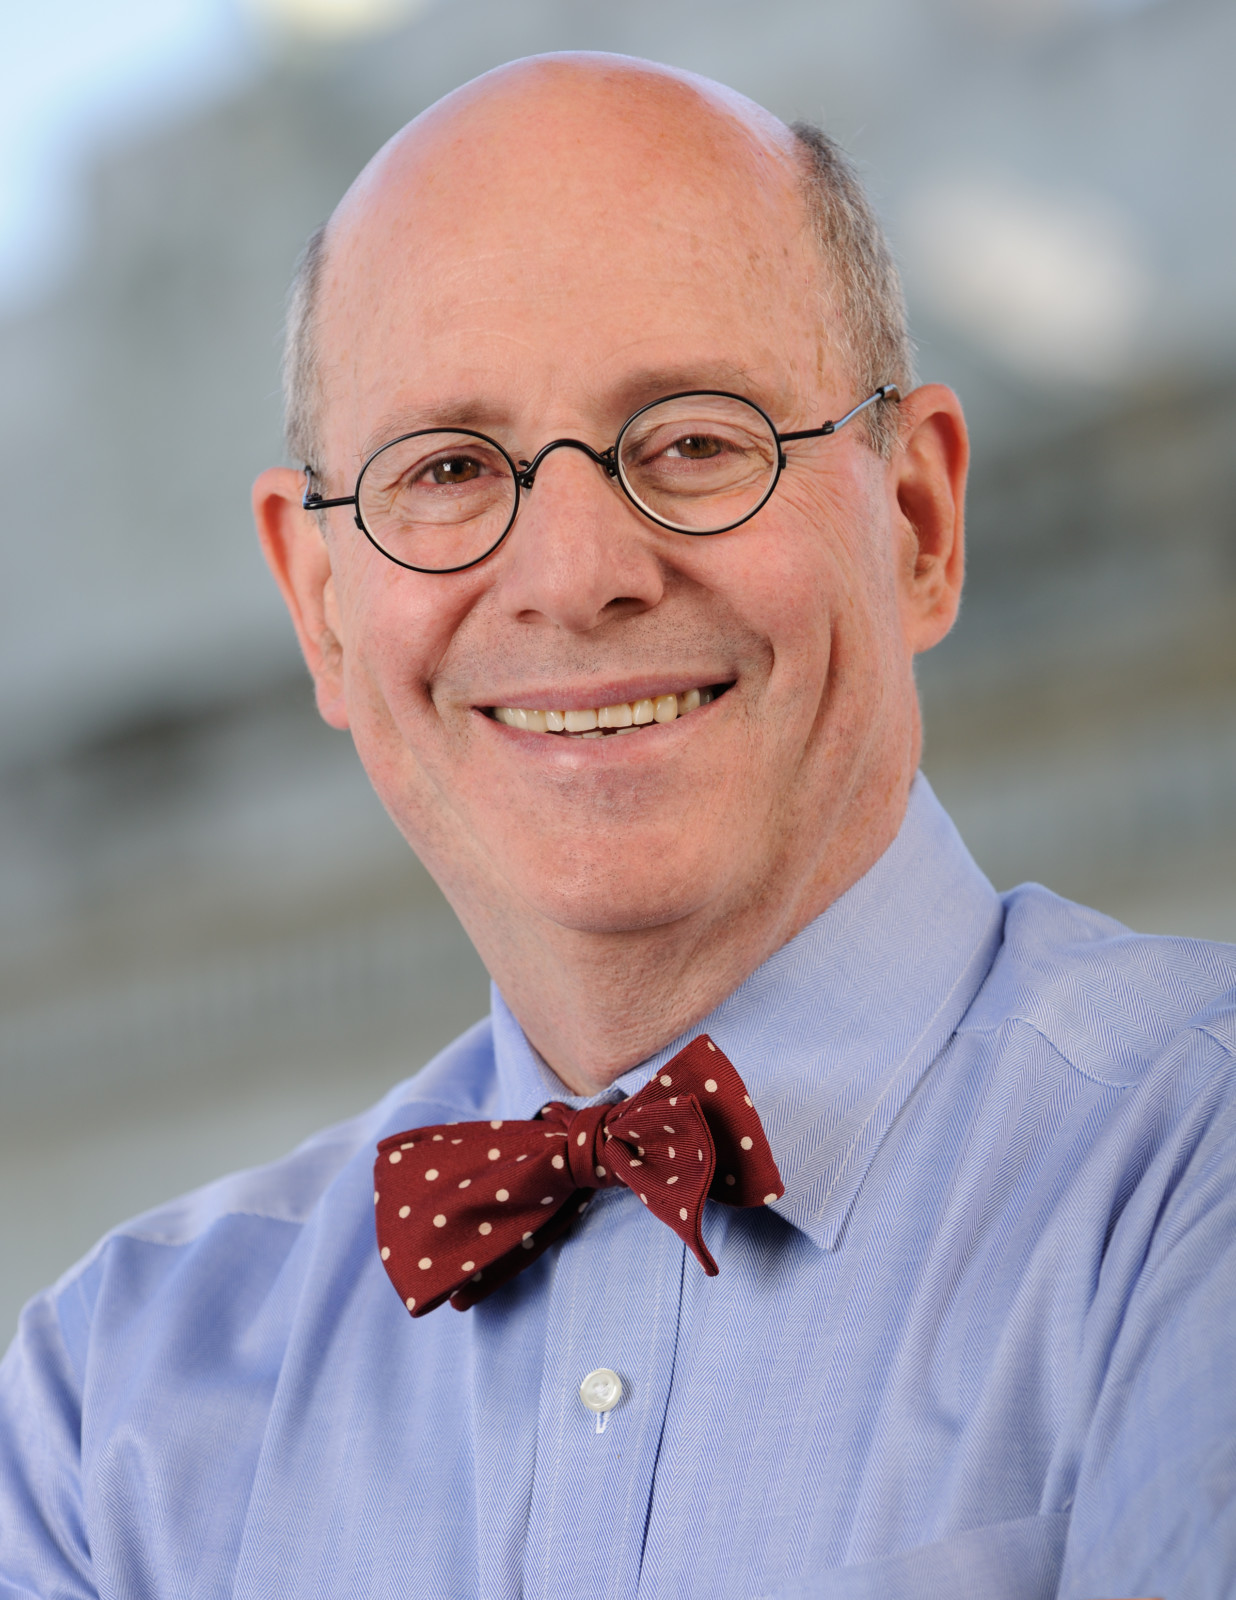 Dr Jeffrey Drazen, Editor, New England Journal of Medicine Group